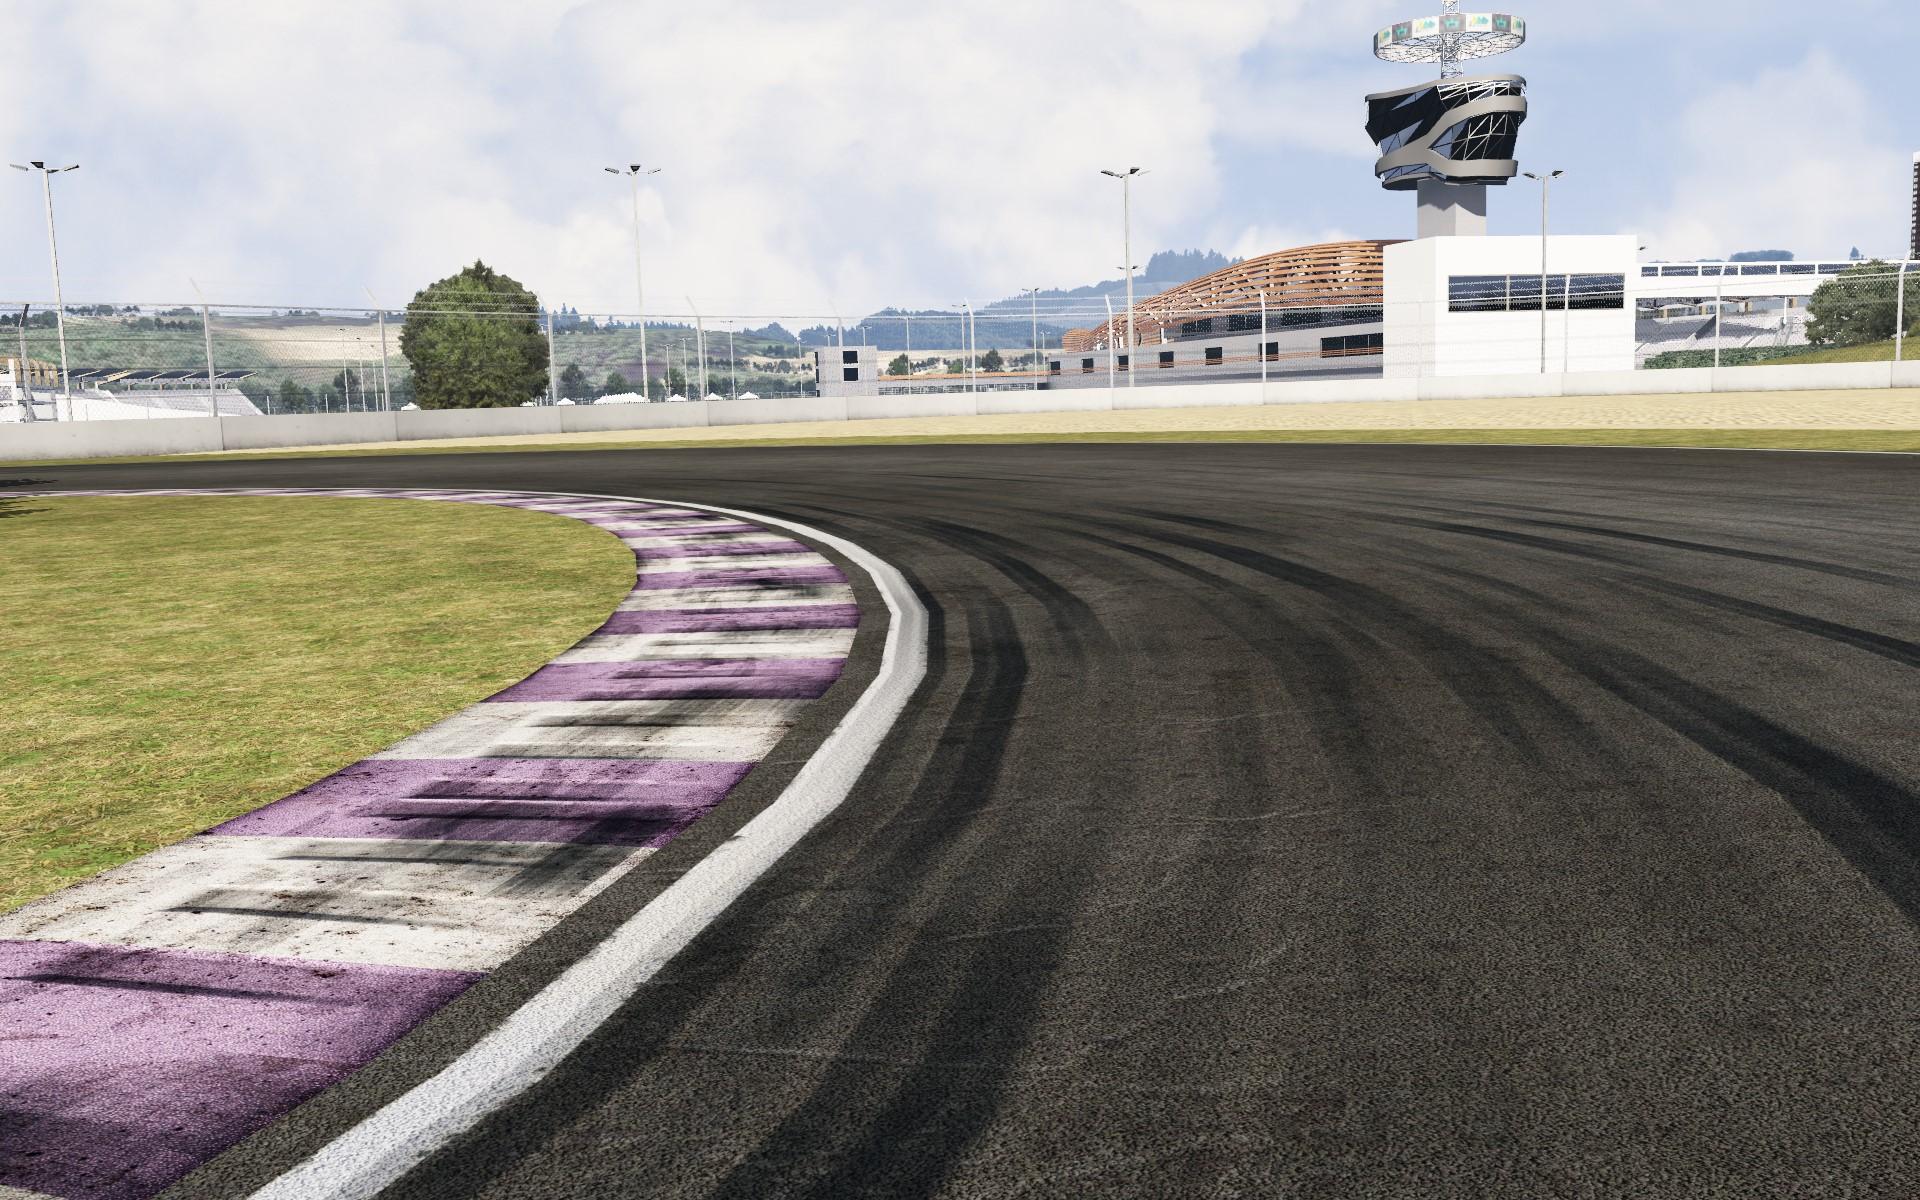 Screenshot_ks_corvette_c7r_toscana_0.2_10-11-116-9-32-56.jpg